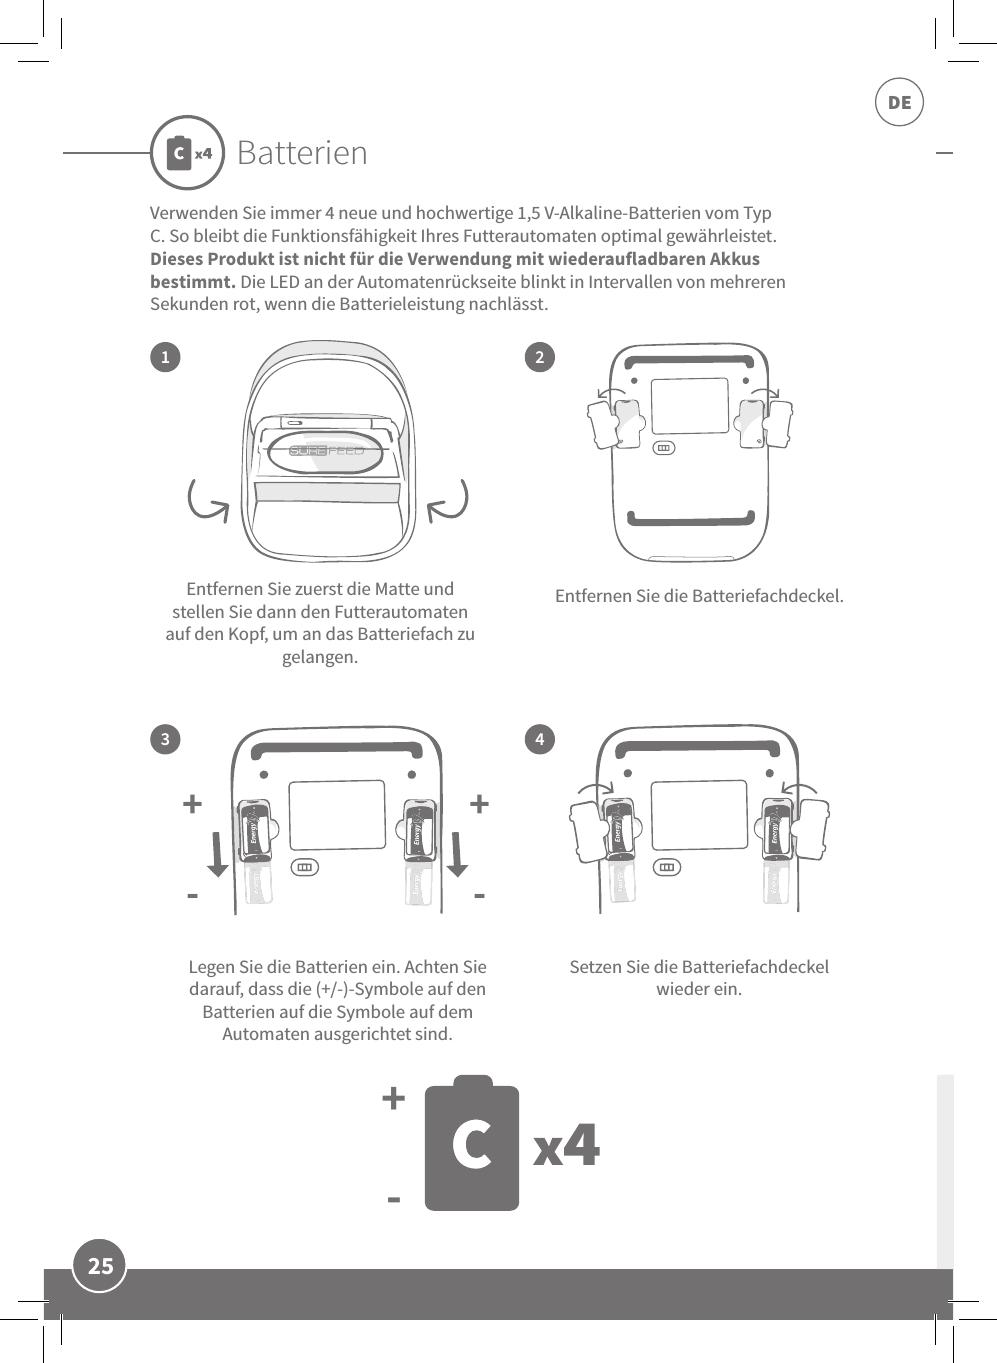 sureflap microchip pet door instruction manual